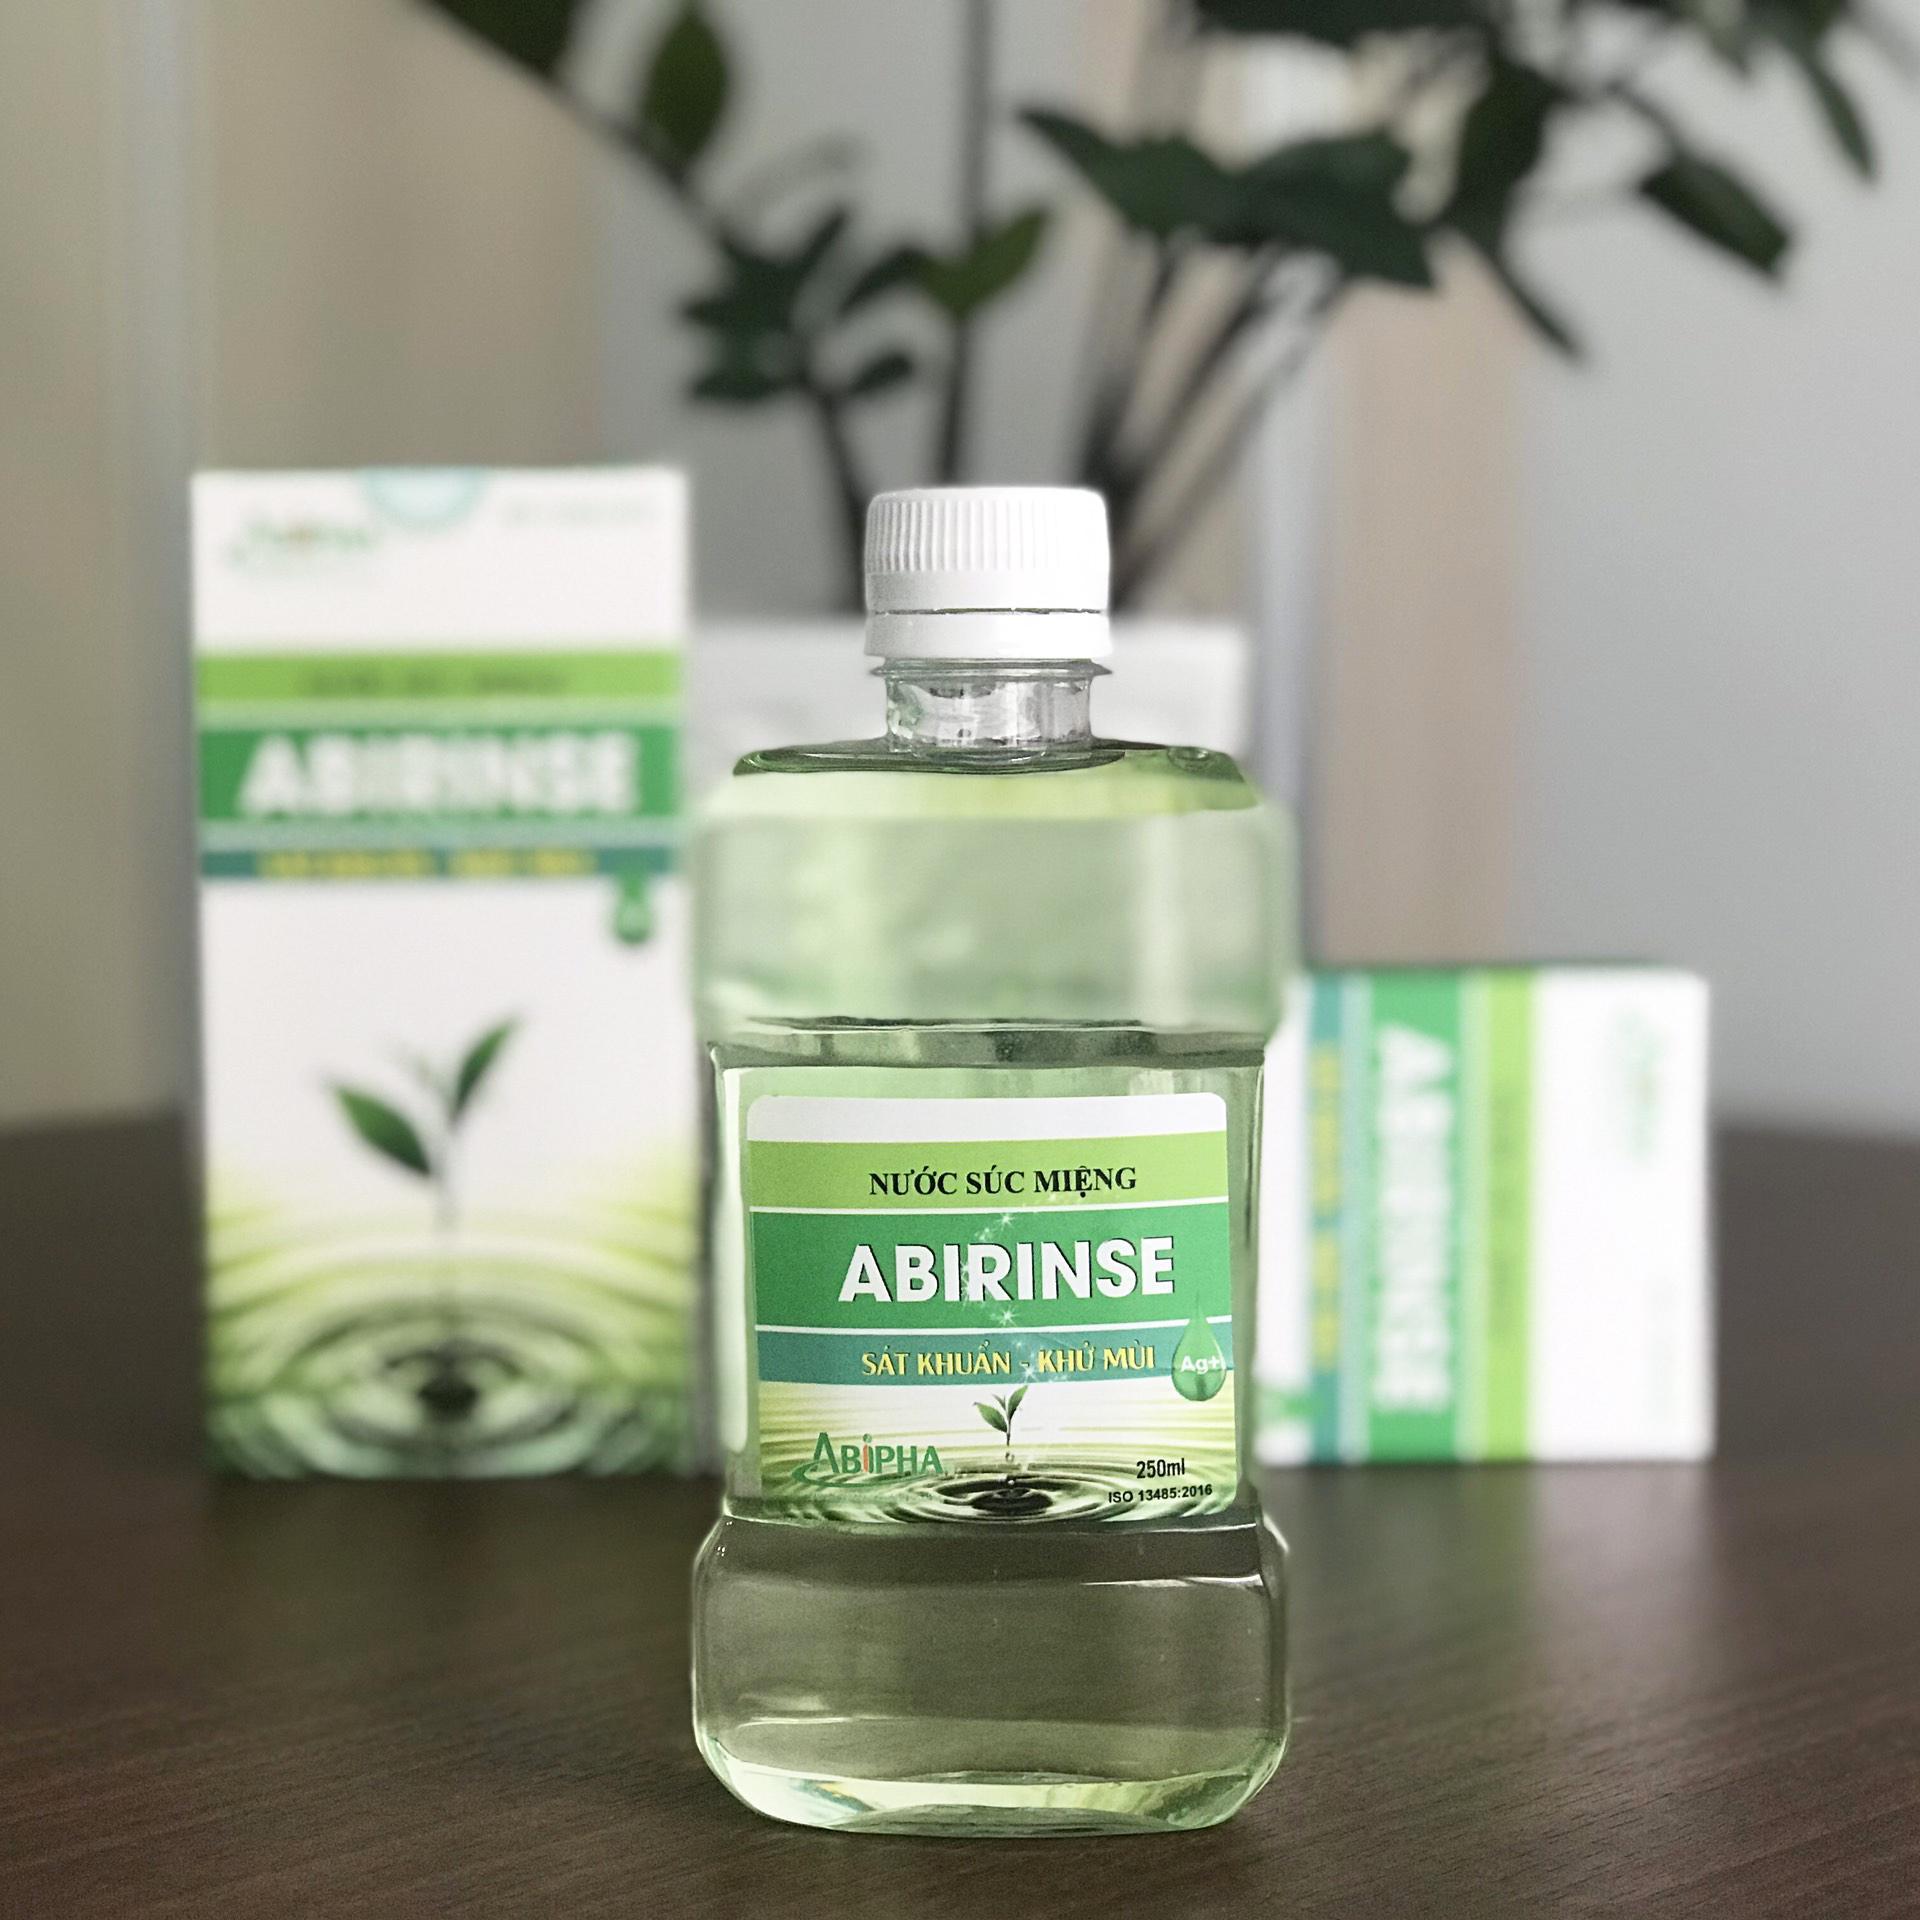 Nước súc miệng ABIRINSE - Chlorhexidine 0,12%